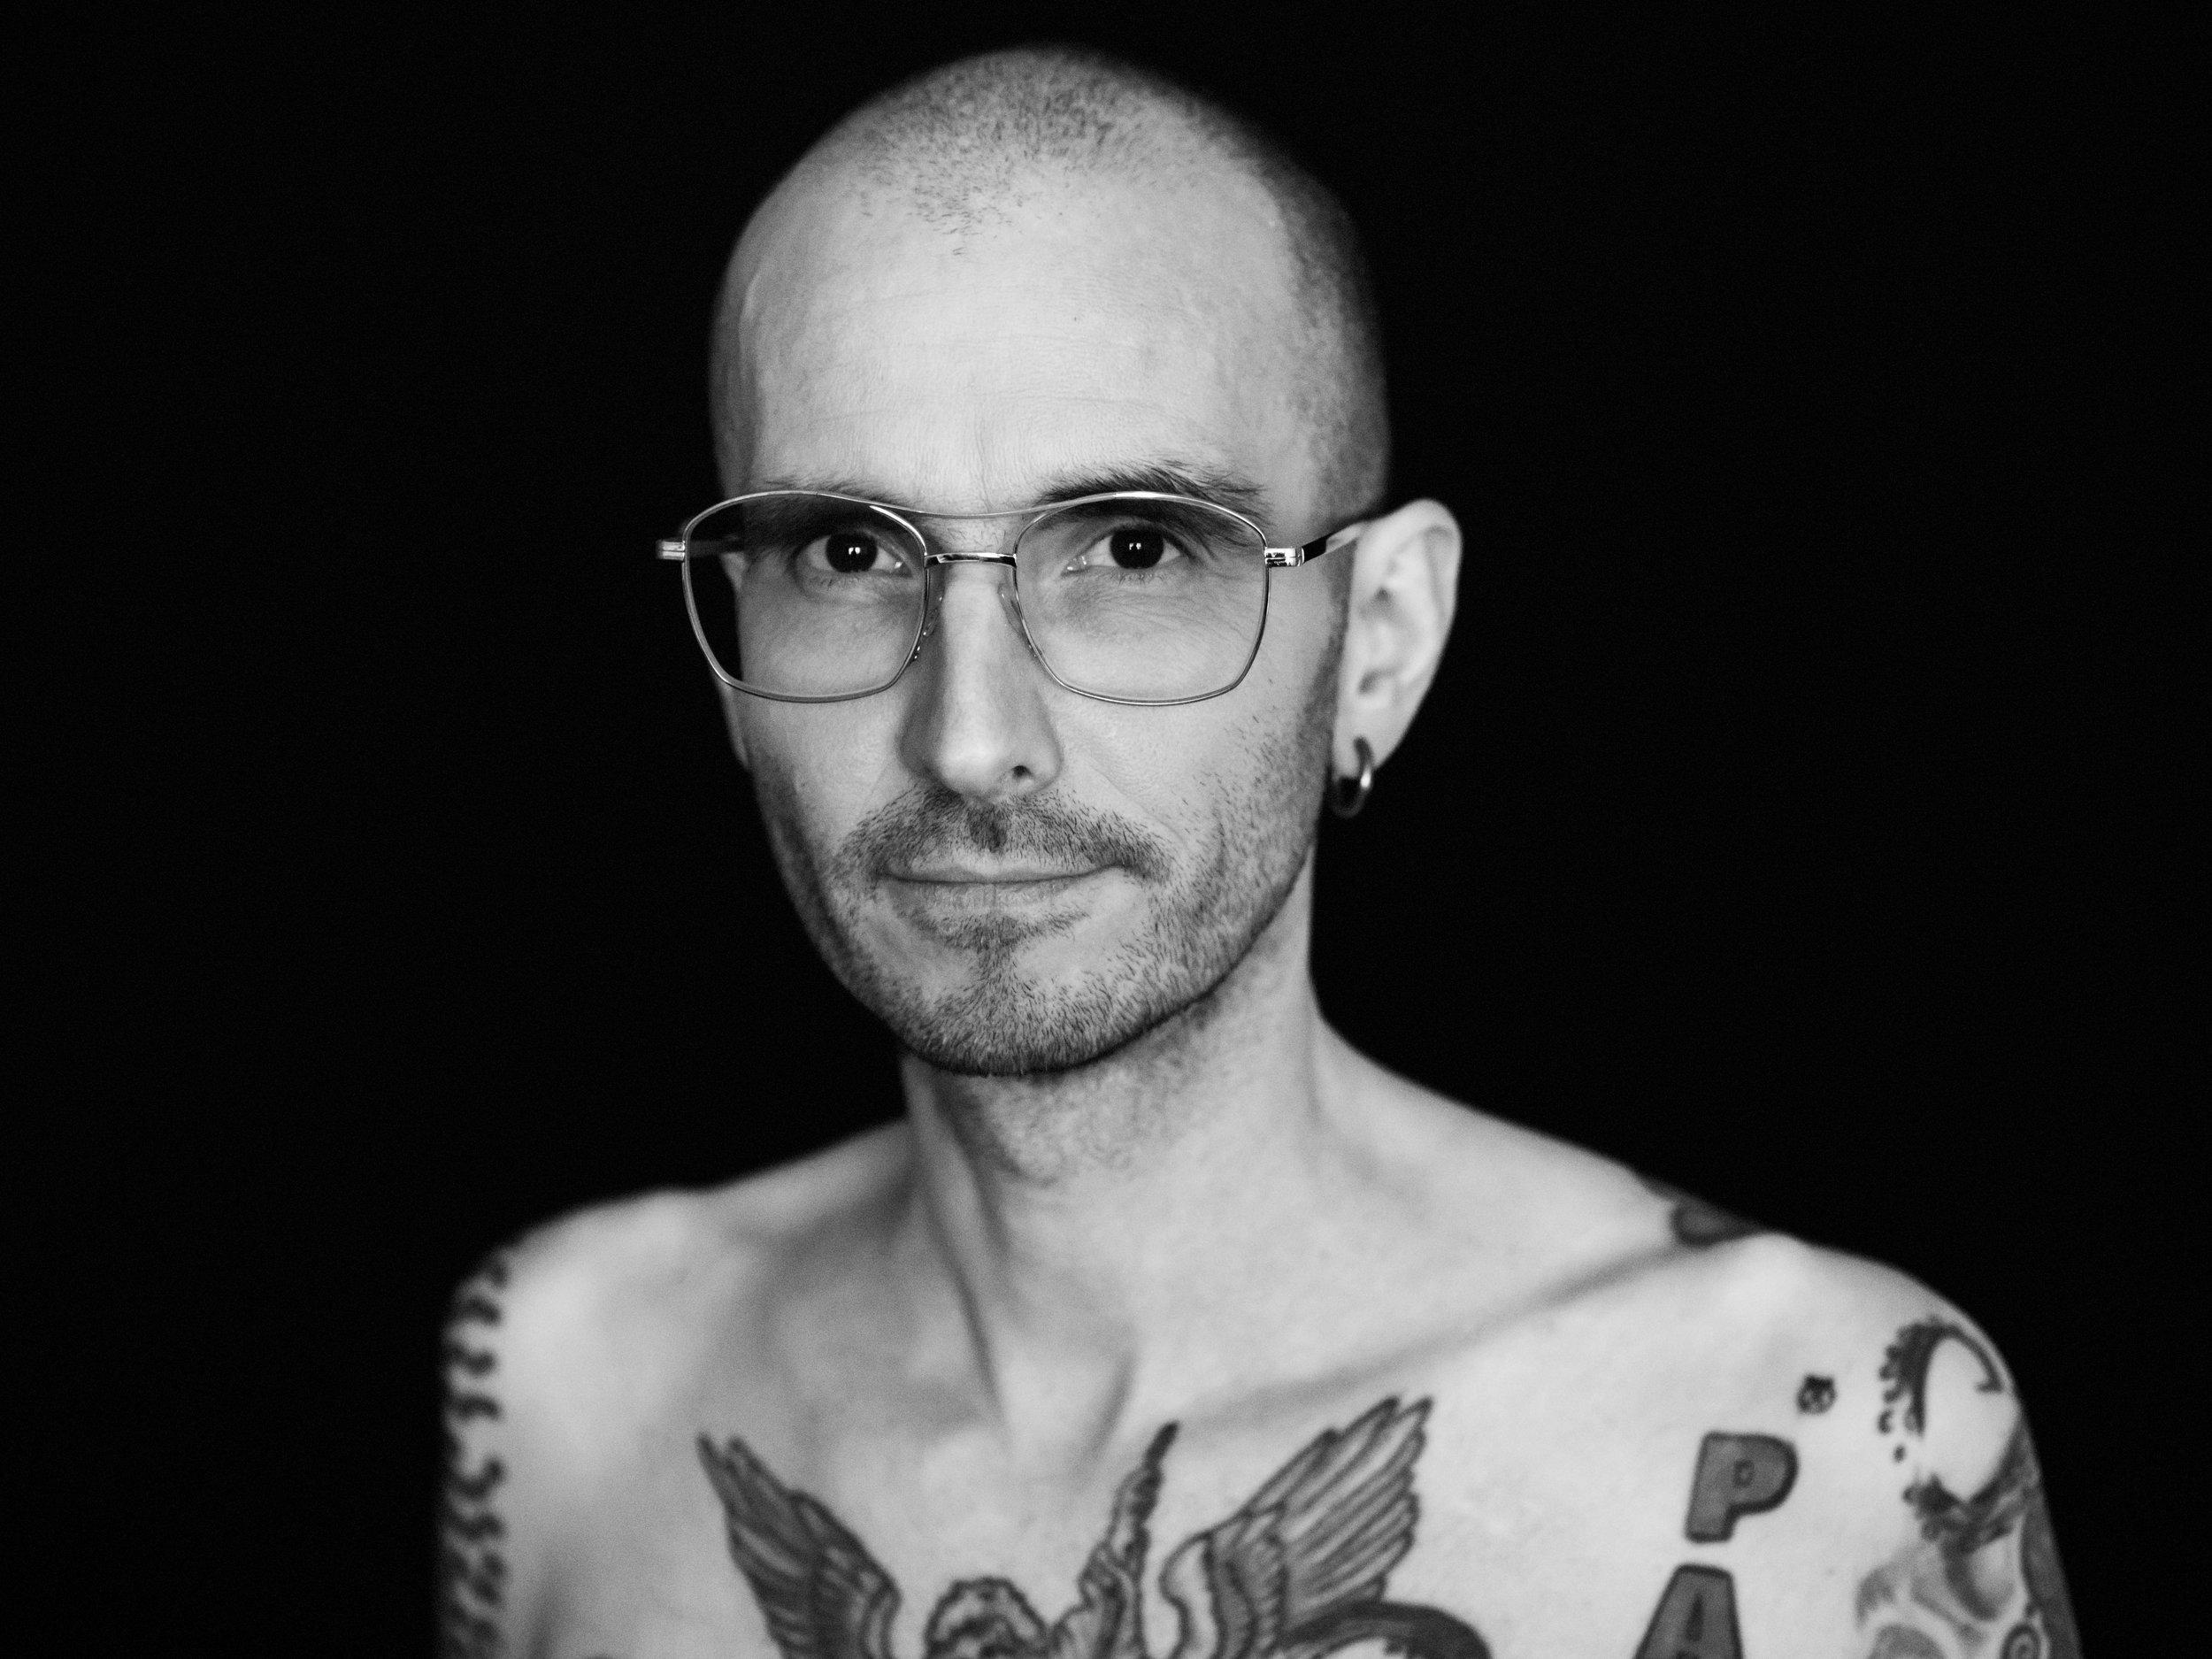 Mark Benecke Portraitfotograf Daniel Hammelstein Bonn P1000376_Exp2.jpg